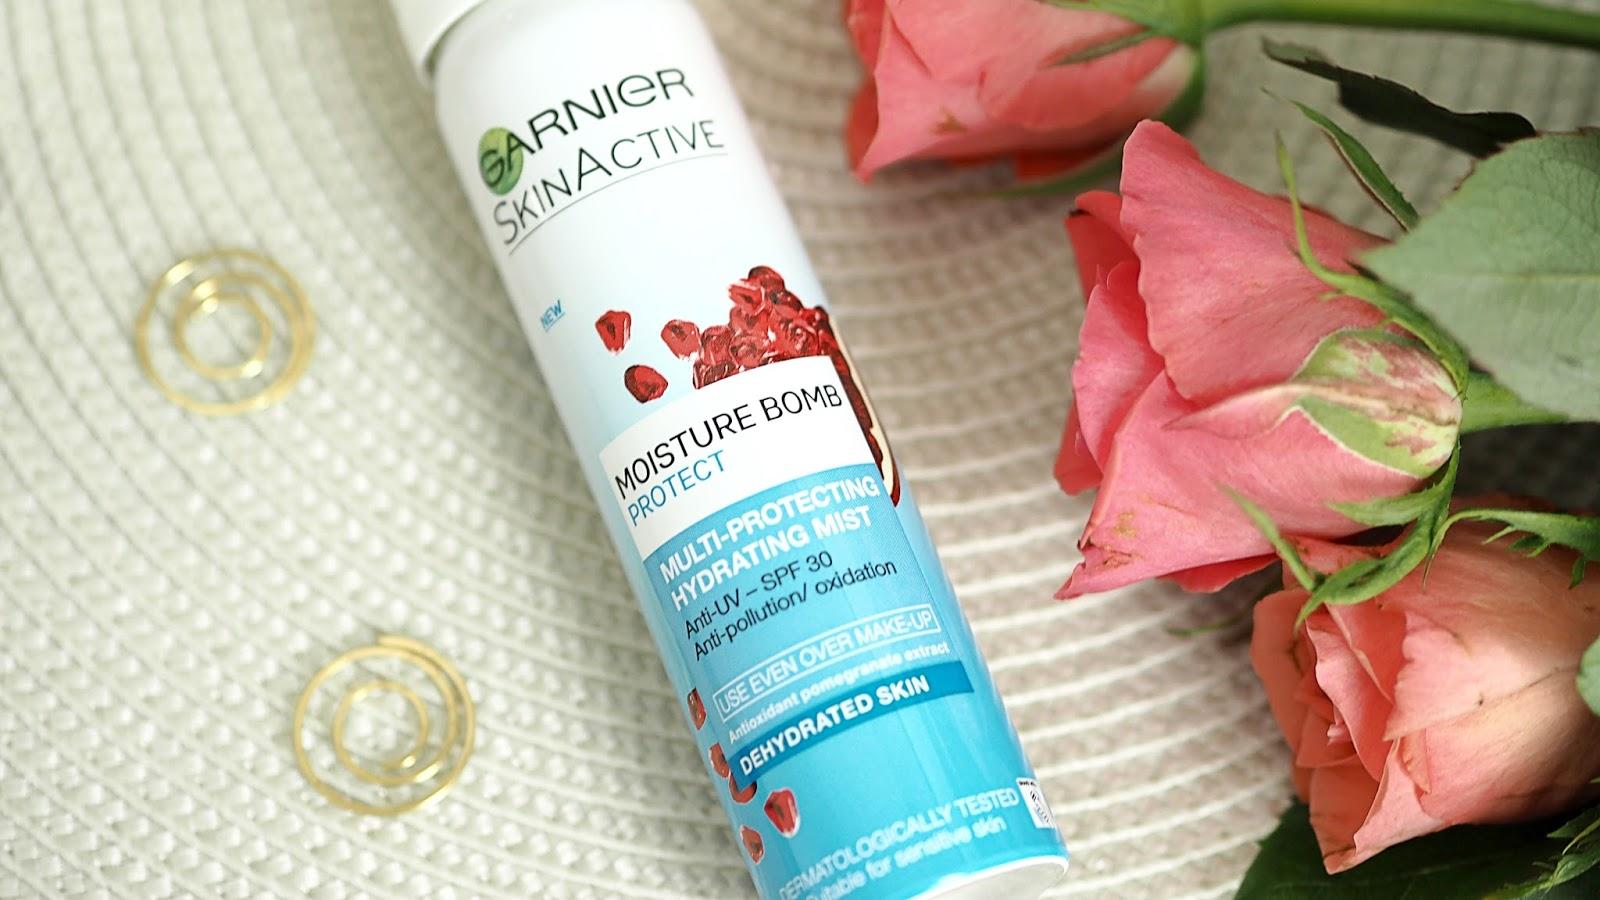 Garnier Moisture Bomb Protecting Hydrating Mis